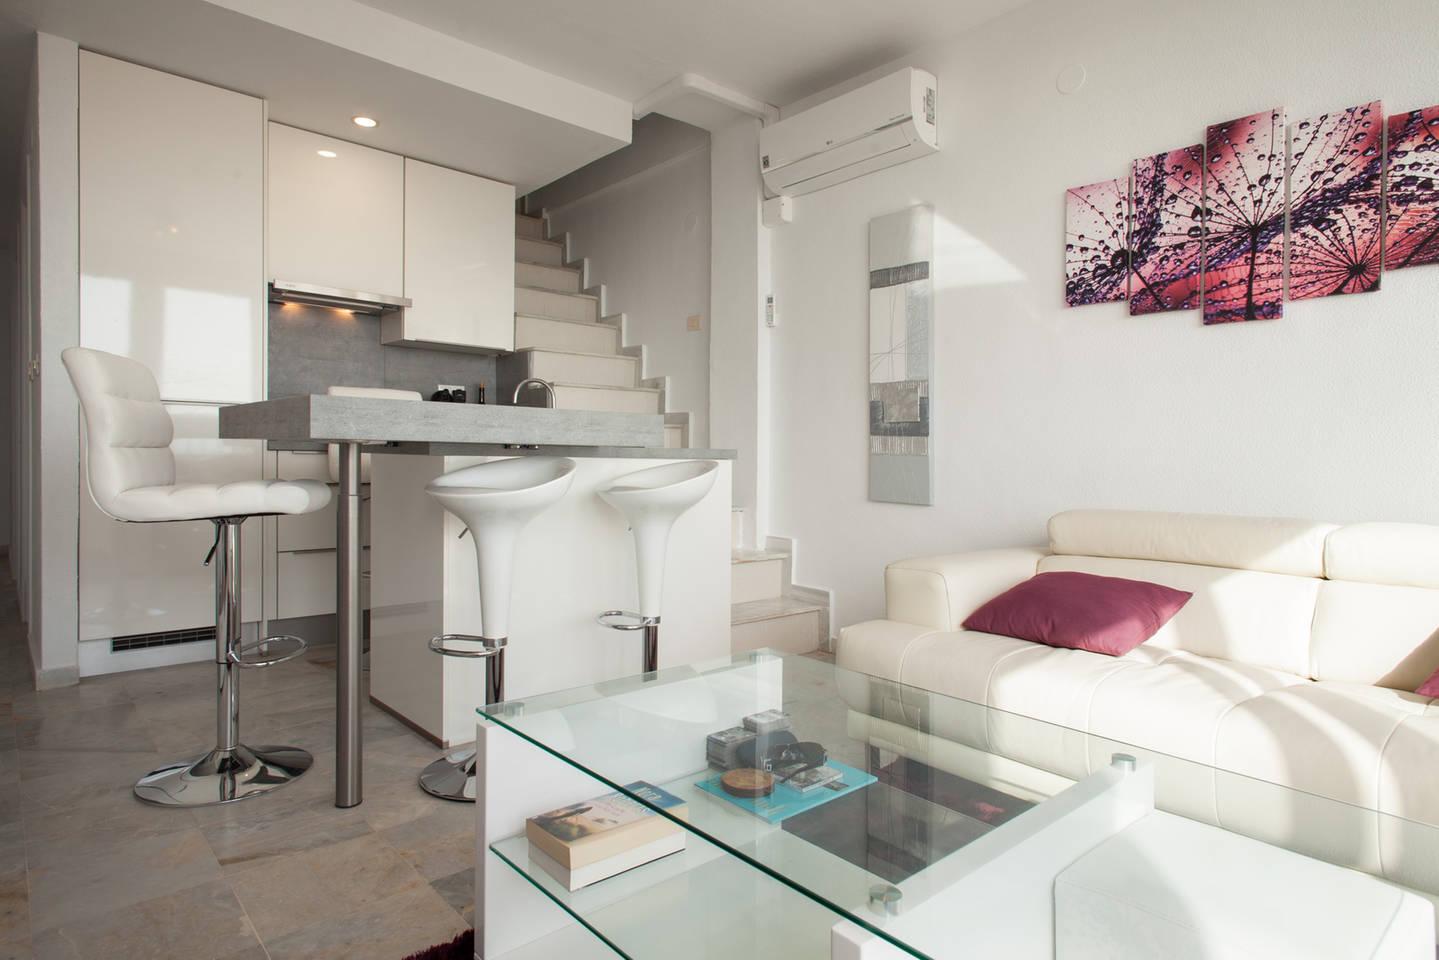 Appartement de vacances apartment in La Mata Costa Blanca (2187577), Torrevieja, Costa Blanca, Valence, Espagne, image 23